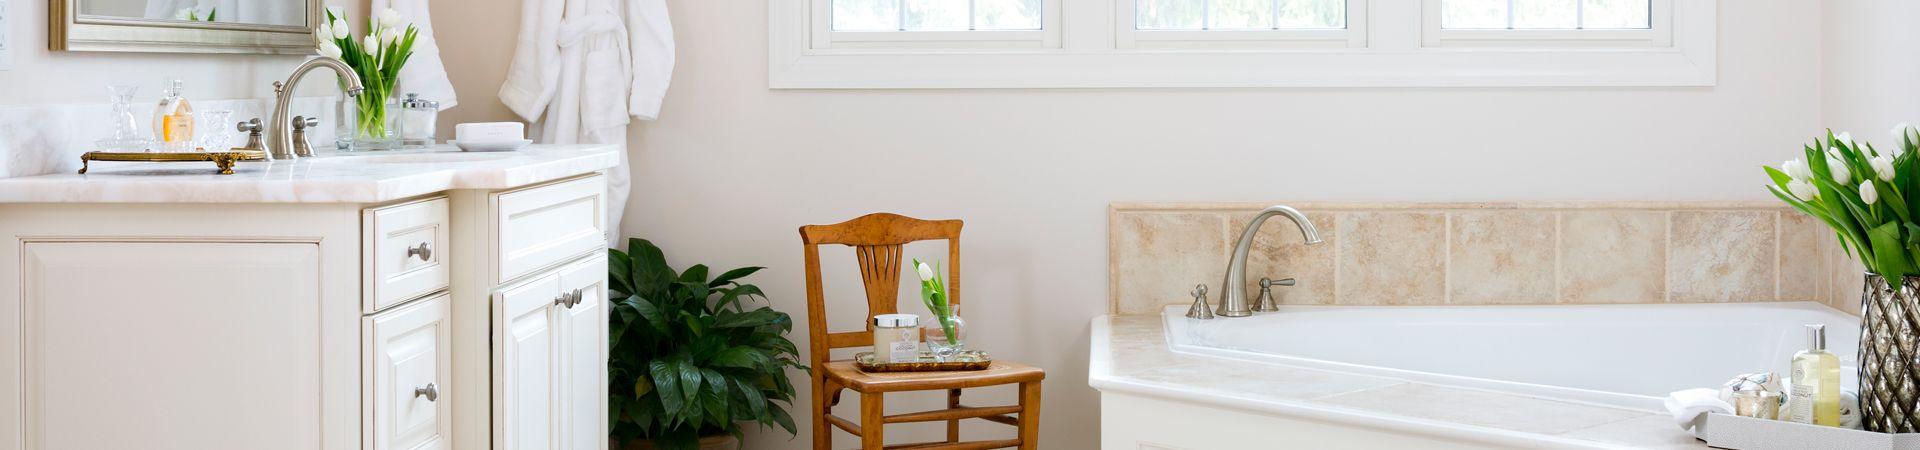 Bathroom remodeling in Fairfax VA, Northern Virginia, MD, DC